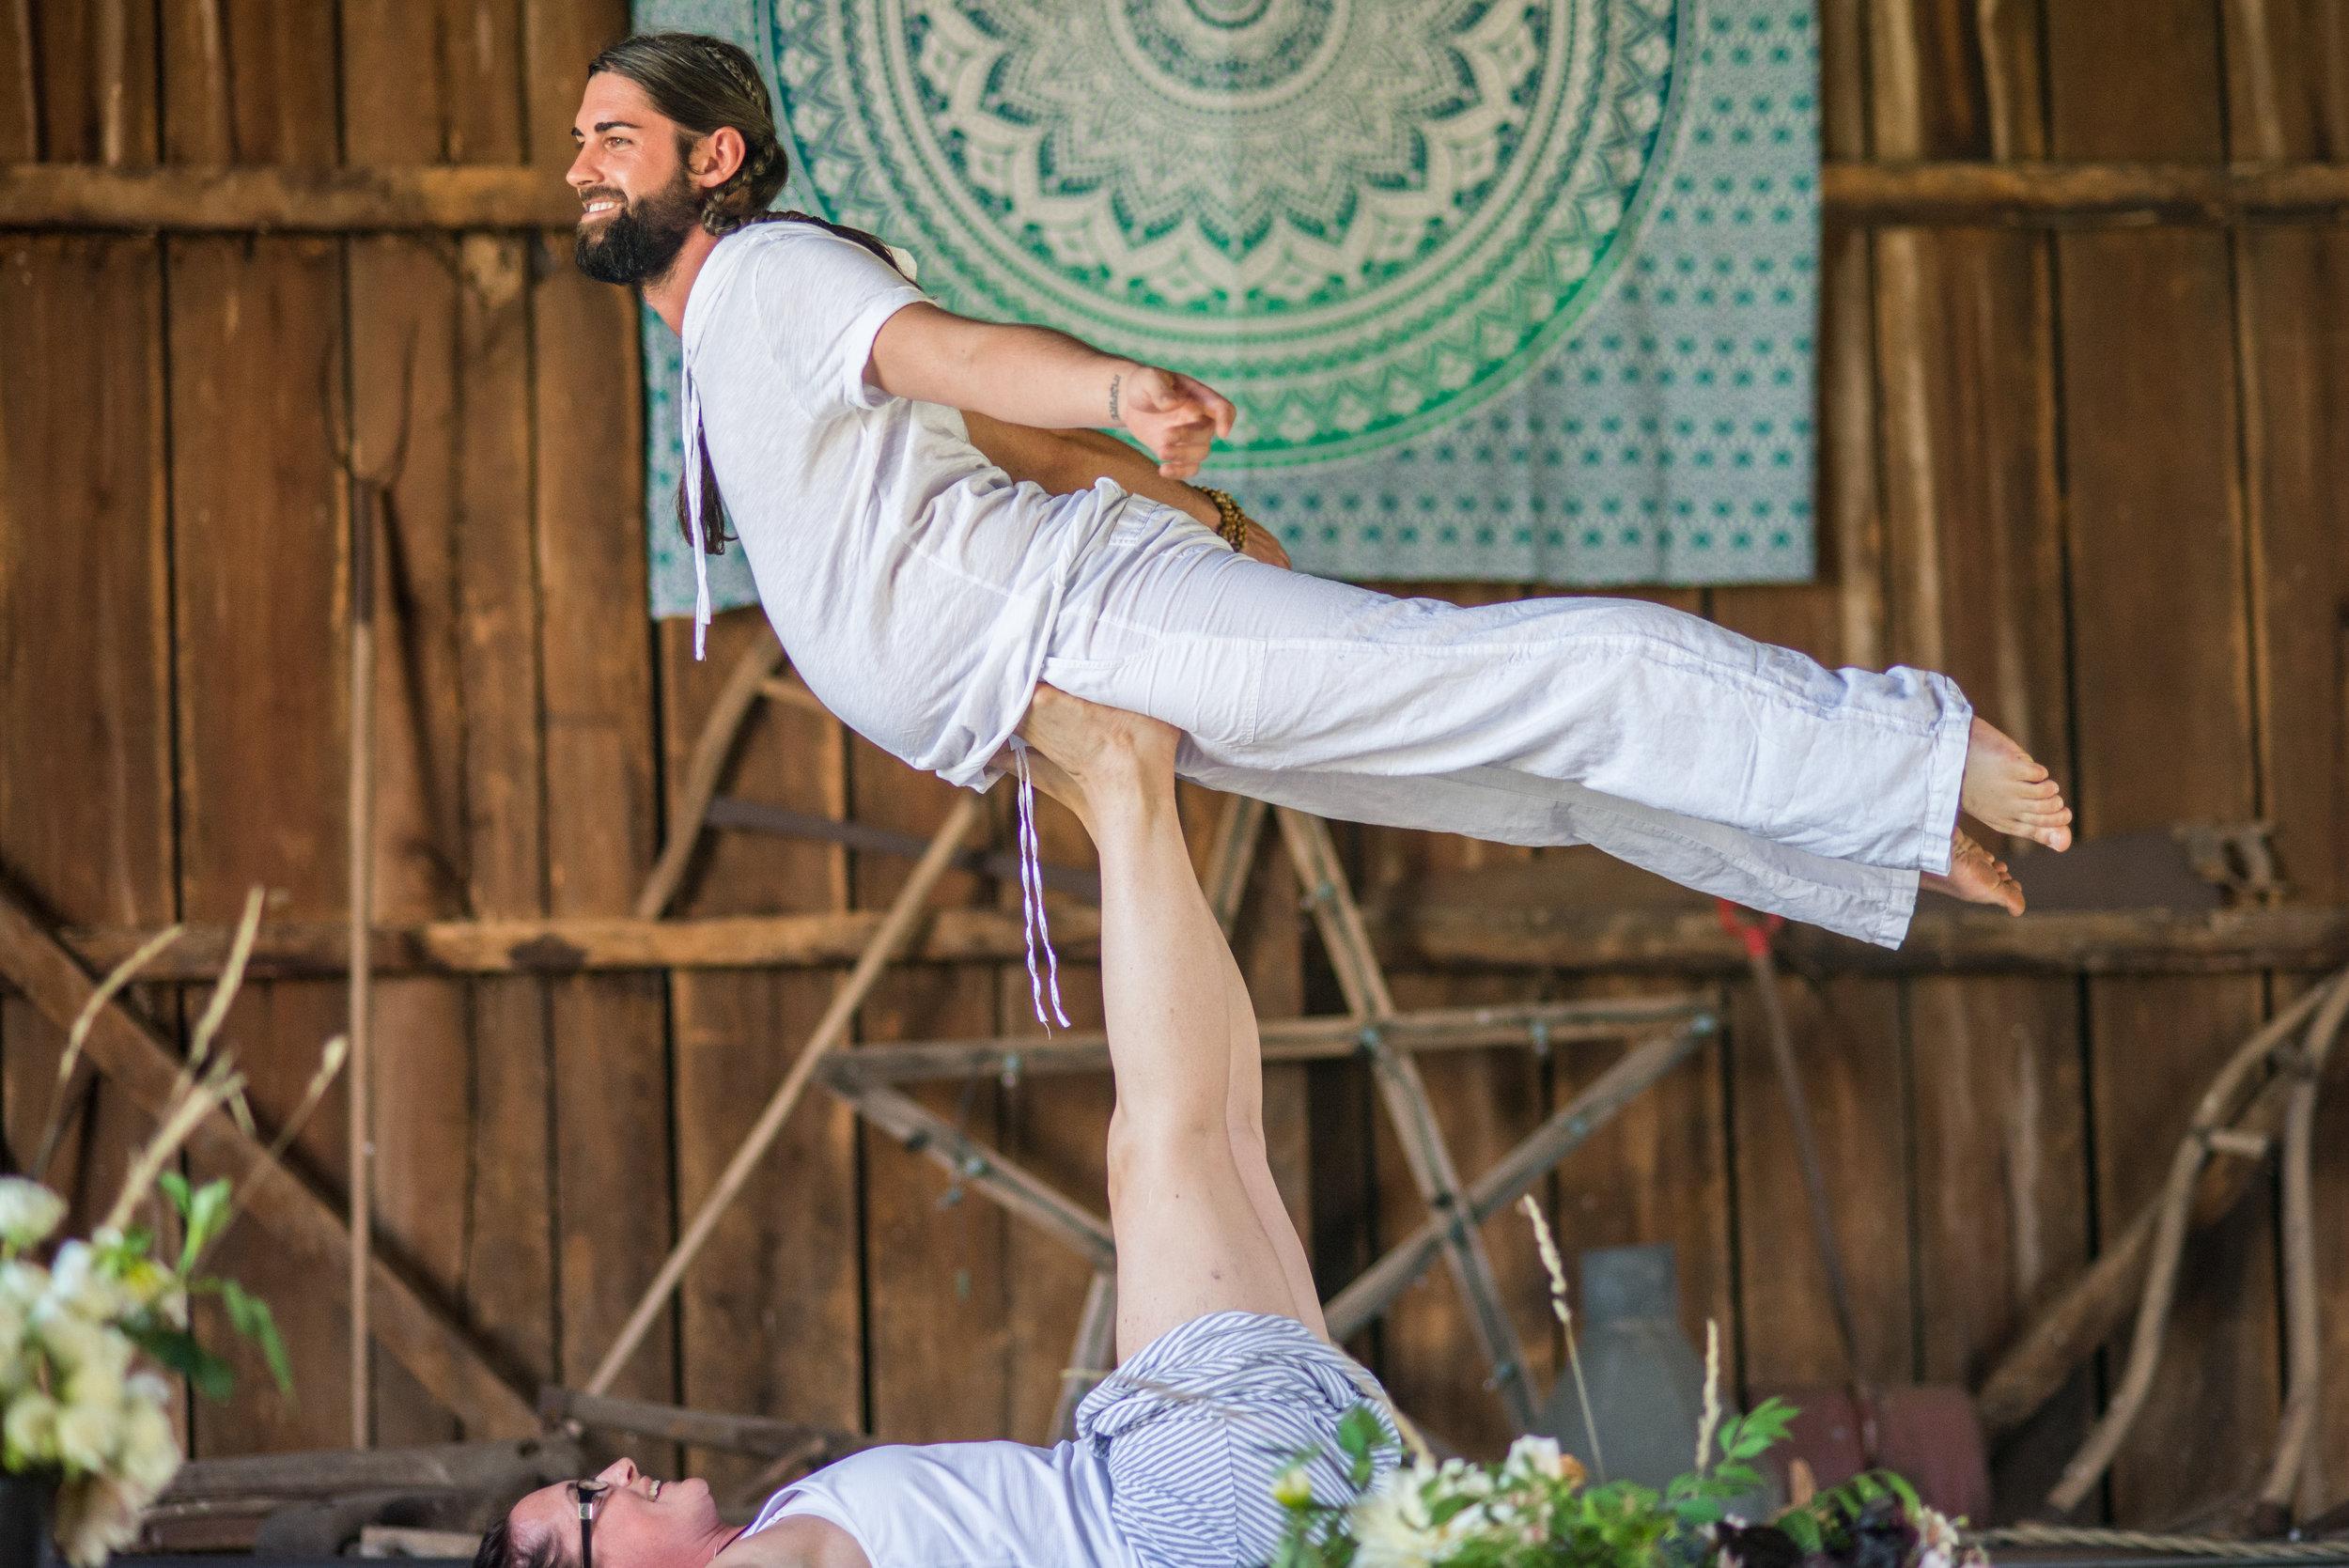 Acro Yoga Jam - Friday's in New Market